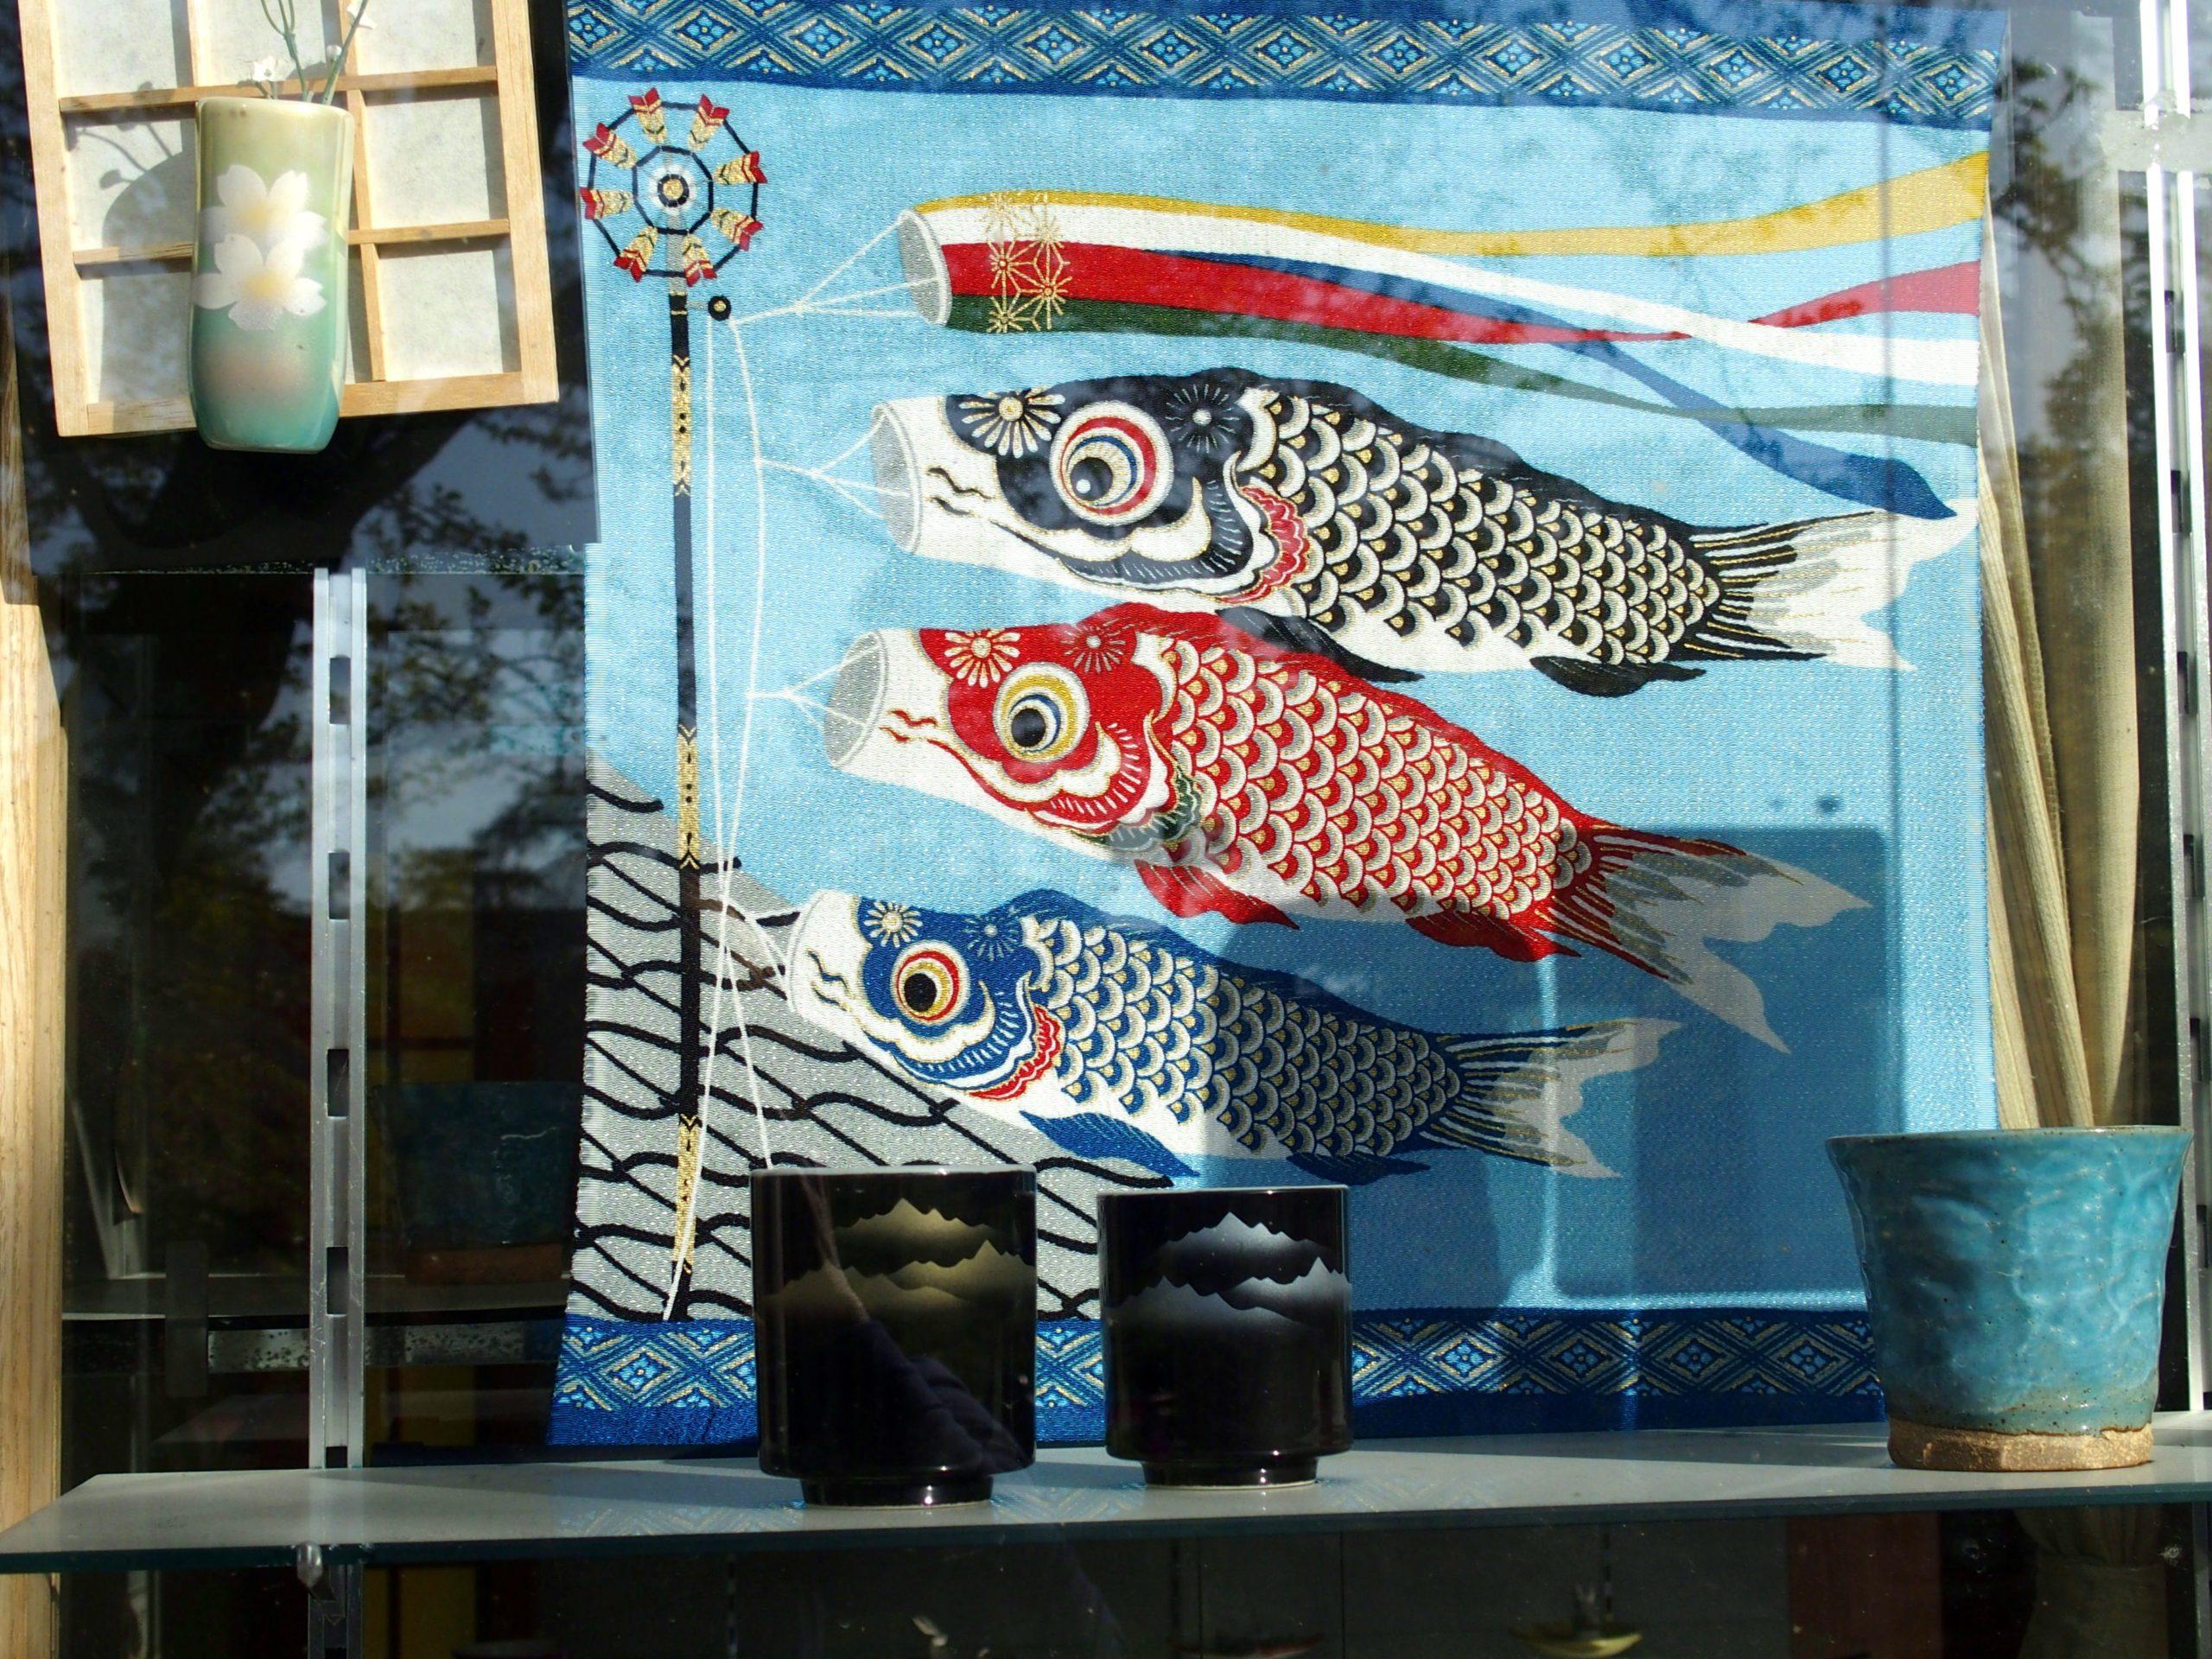 Carpes Koï et céramiques artisanat Kanazawa Japon